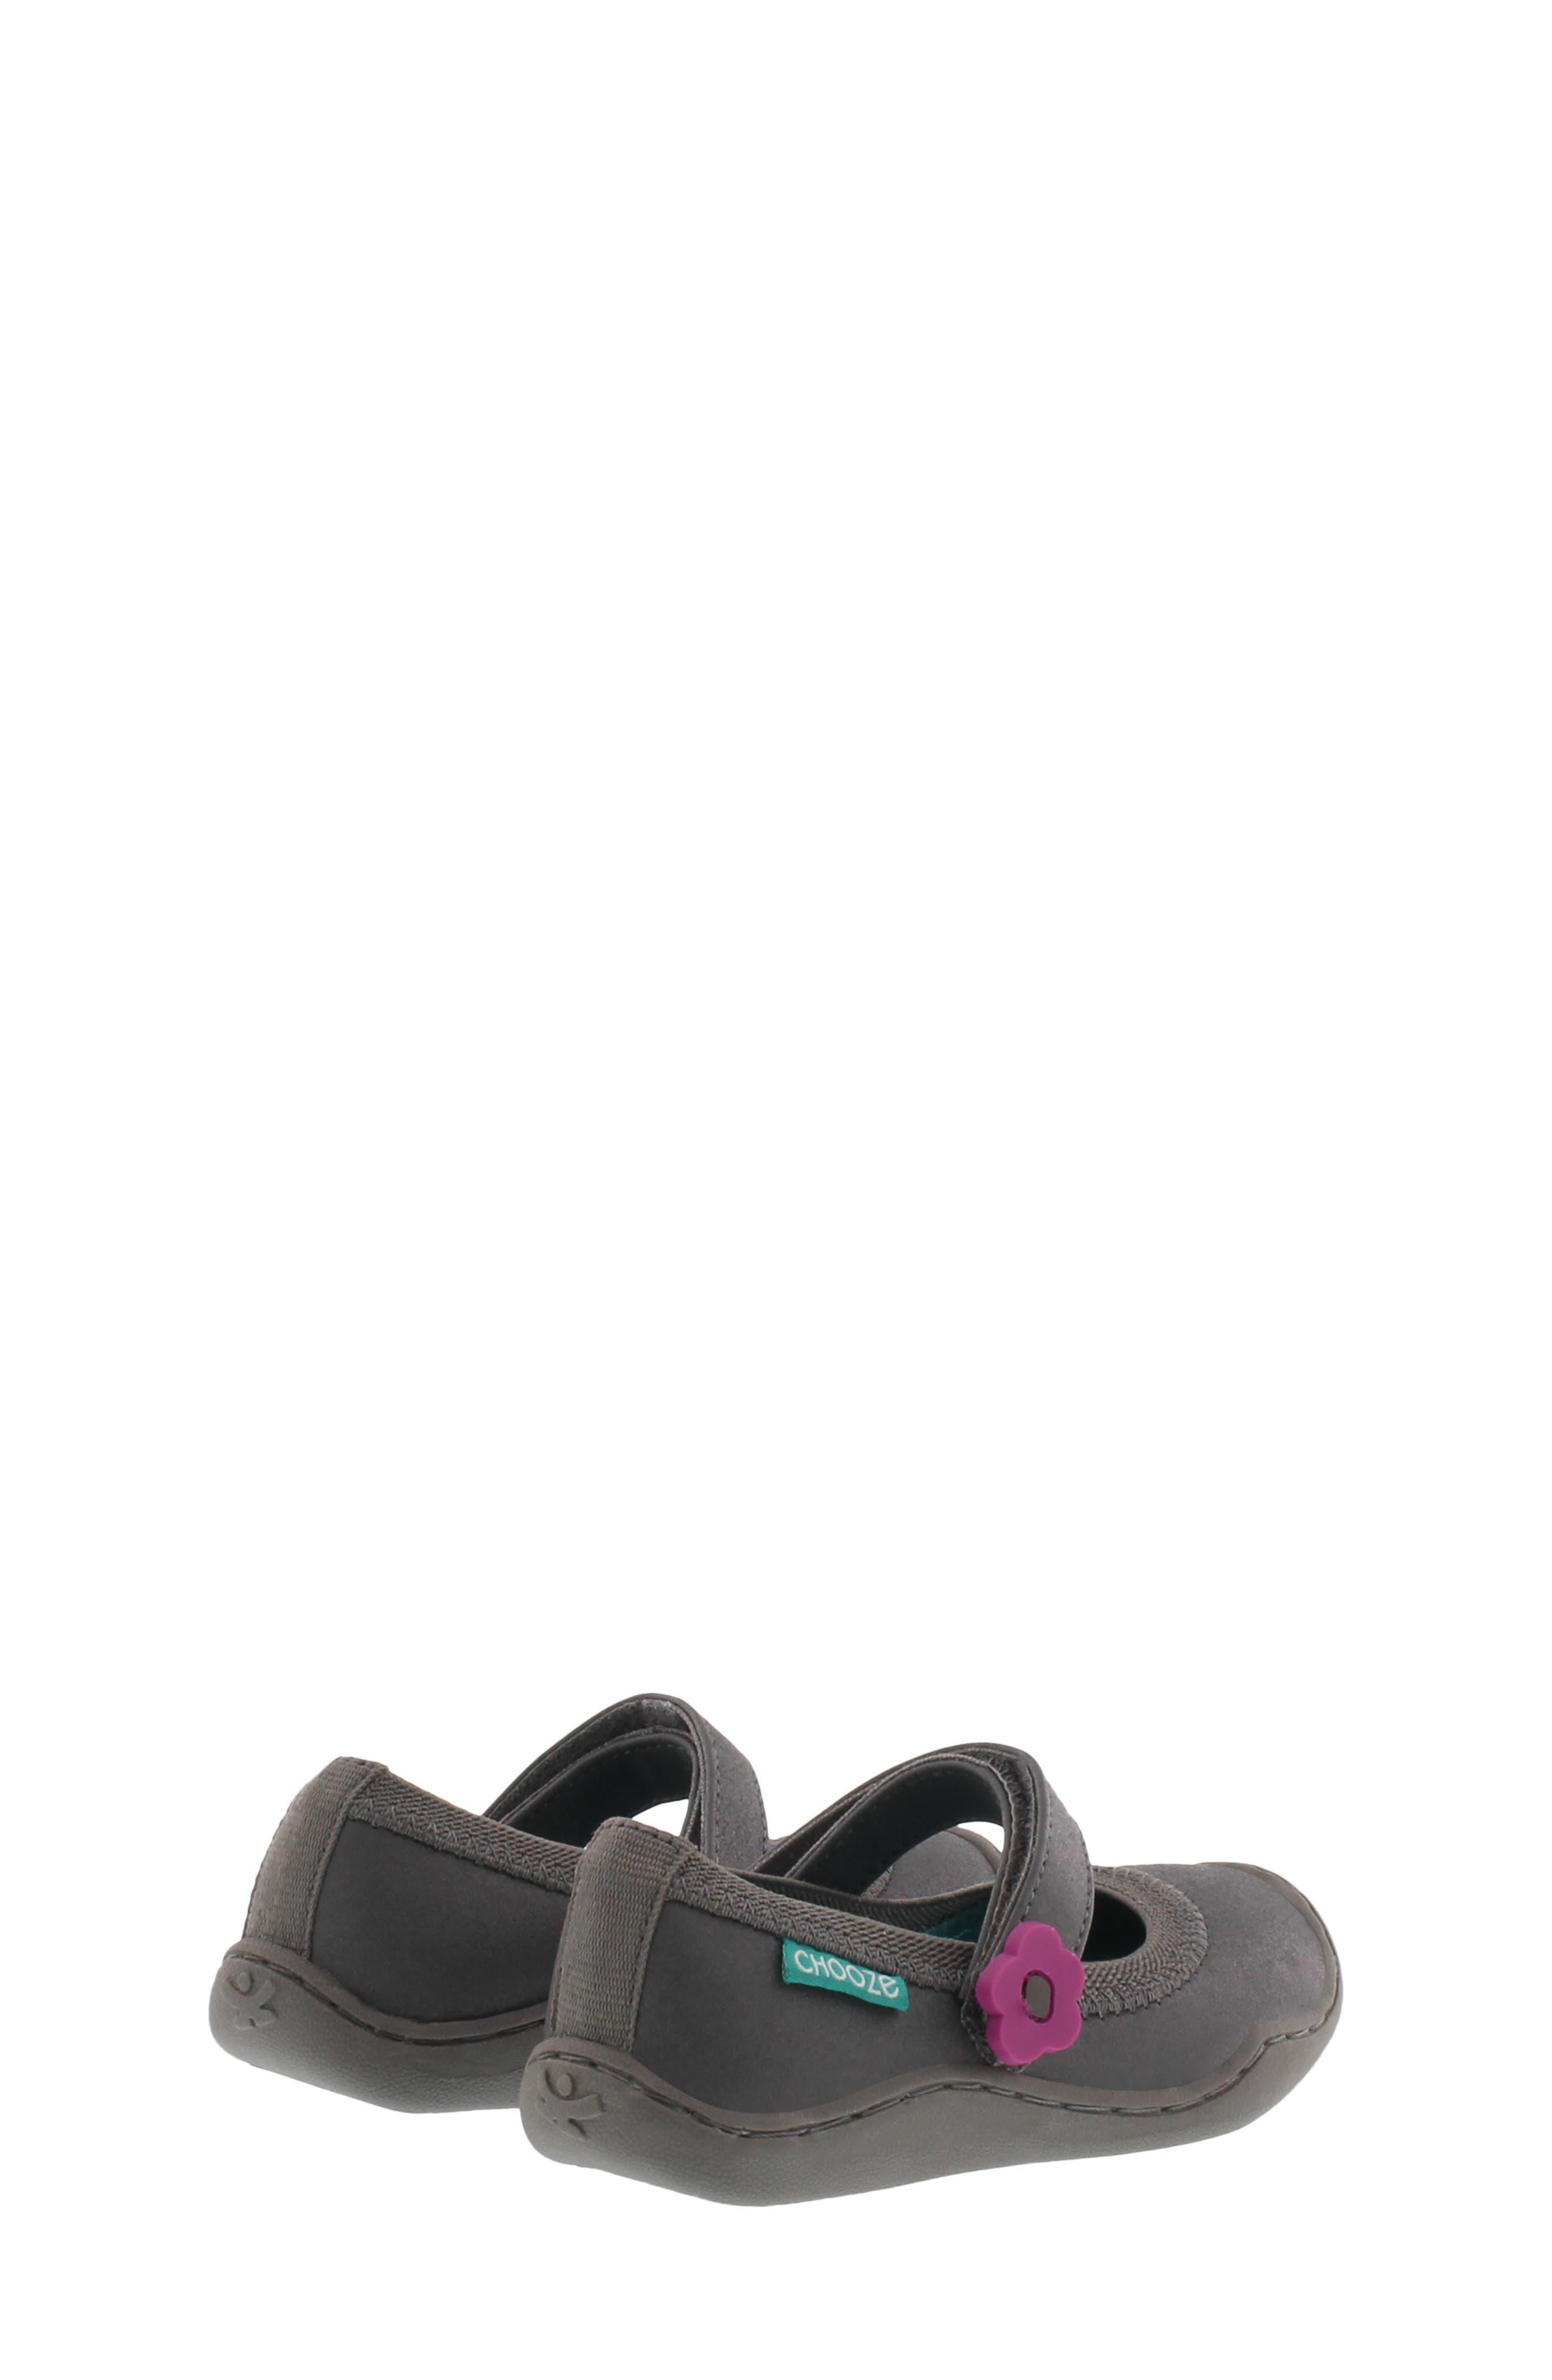 Steady Shimmer Mary Jane Sneaker,                             Alternate thumbnail 2, color,                             PEWTER